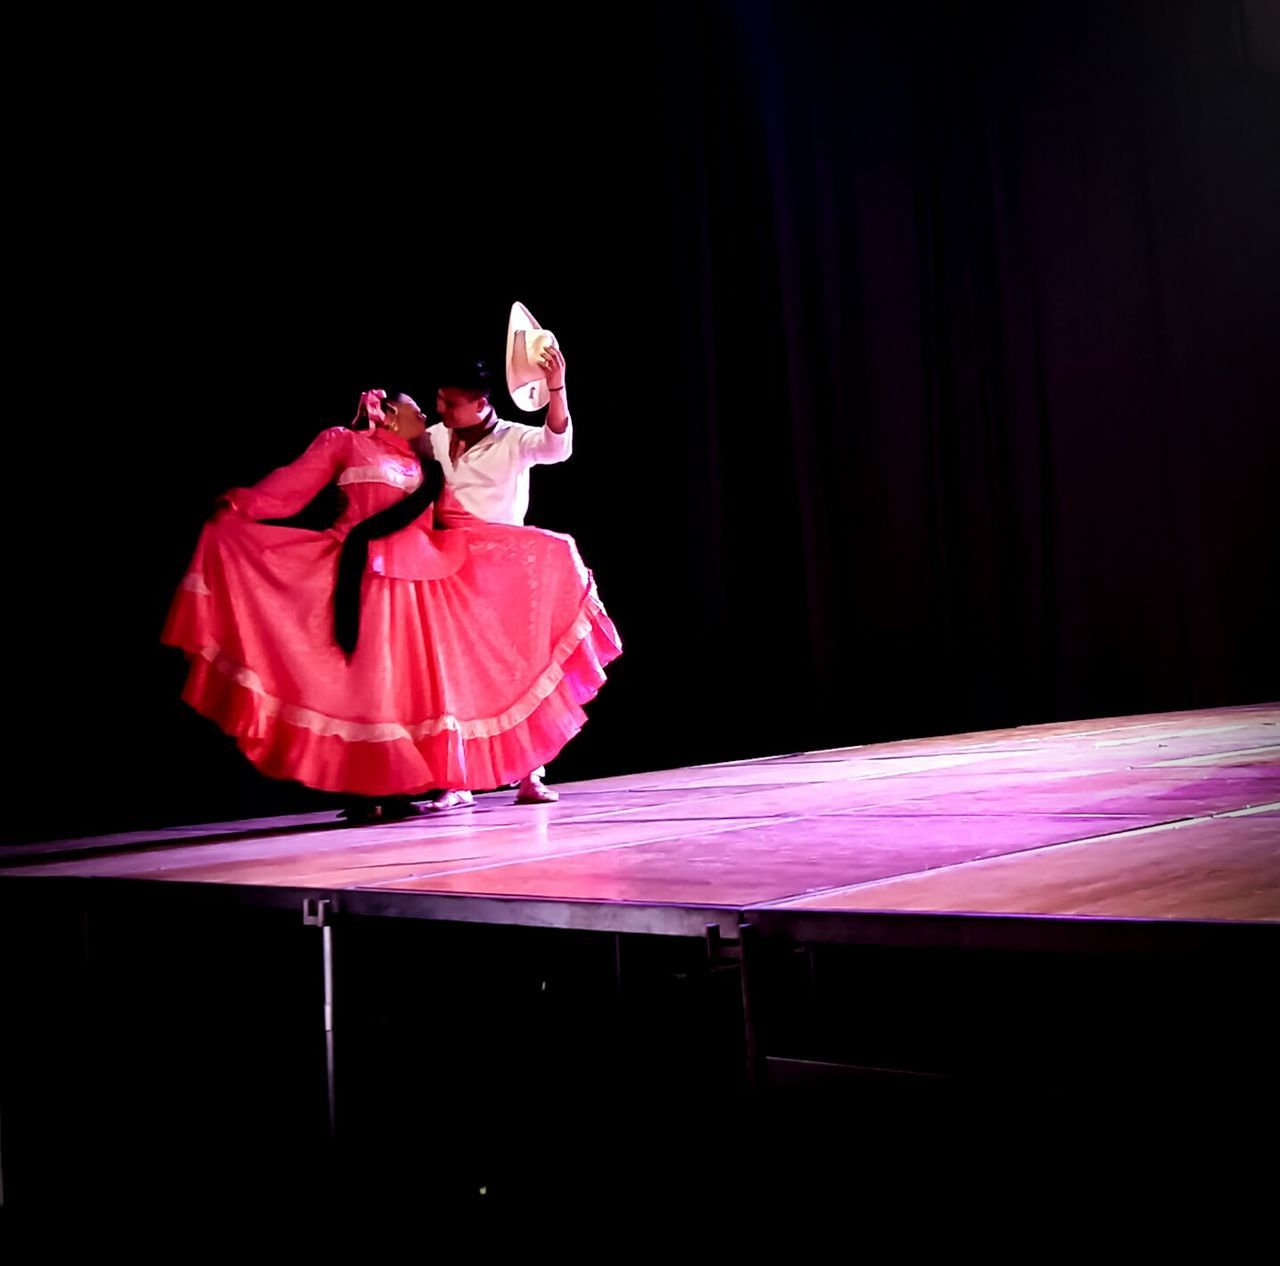 Folk Dance Kiss Rosé Dress